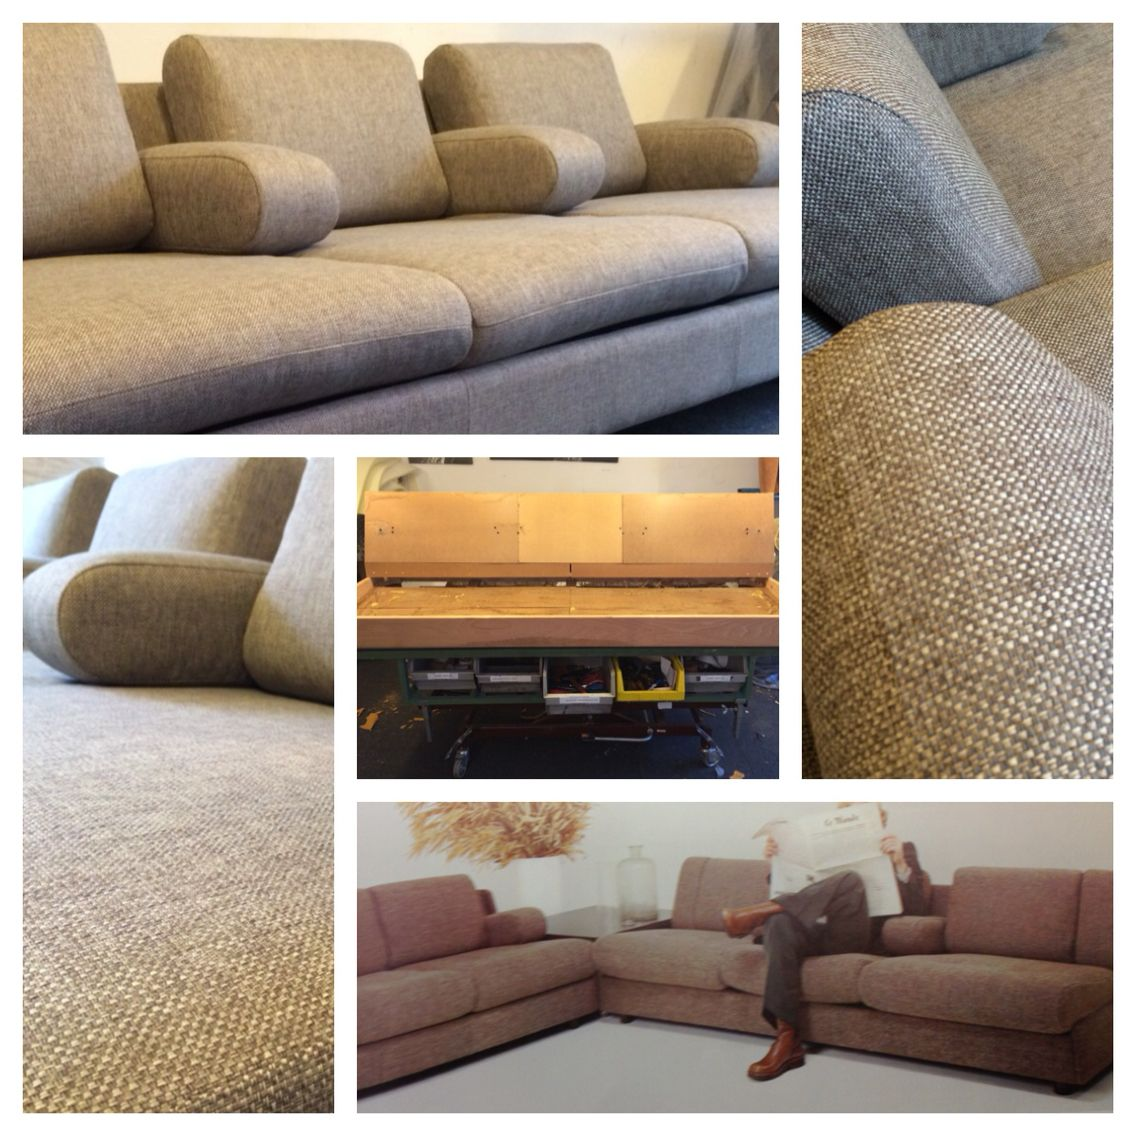 Vintage Leolux sofa 704 before and after restauration.   Upholstery ...